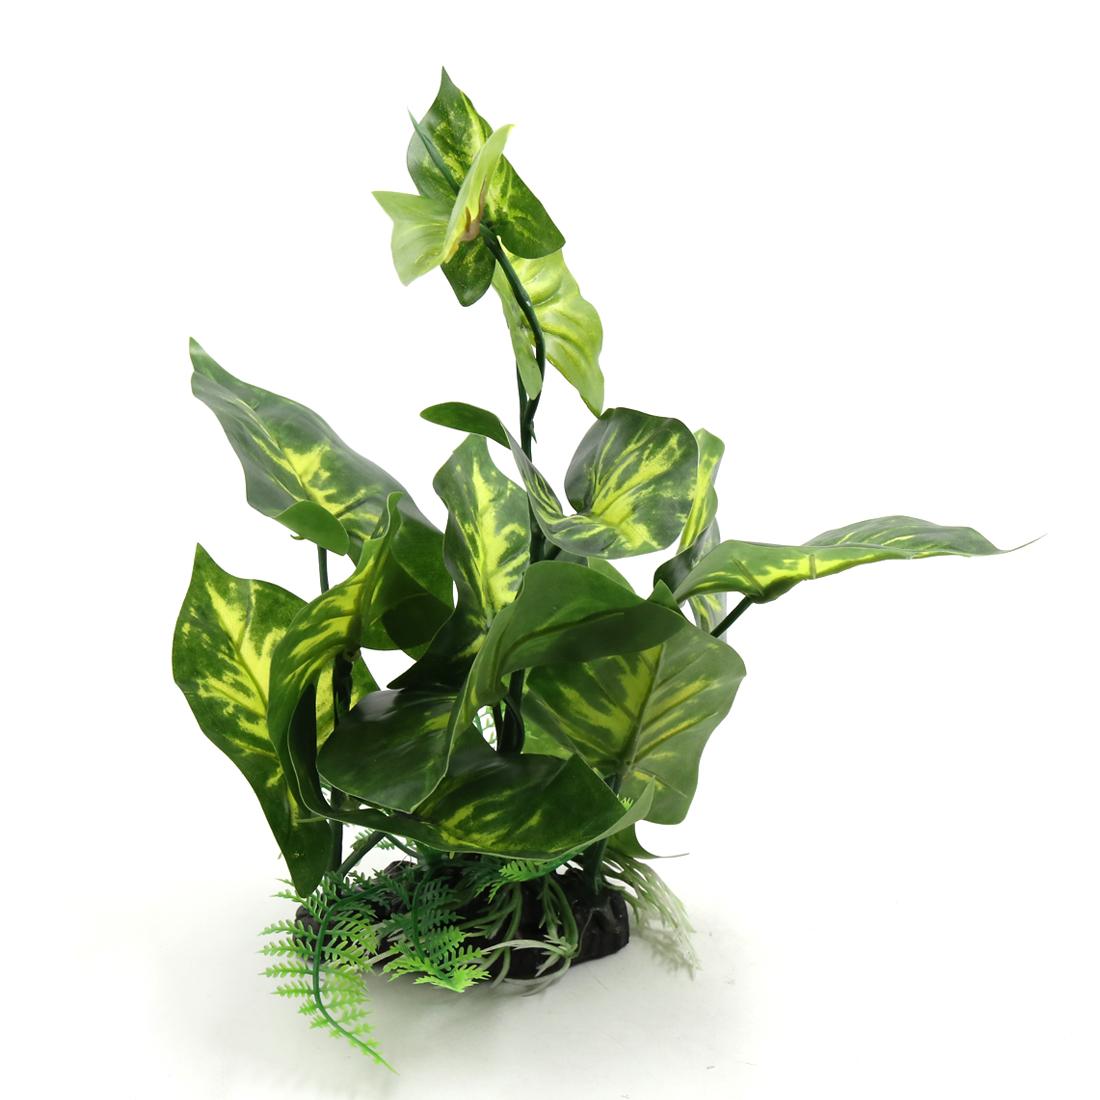 Green Plastic Terrarium Tank Lifelike Plant Decorative Ornament for Reptiles